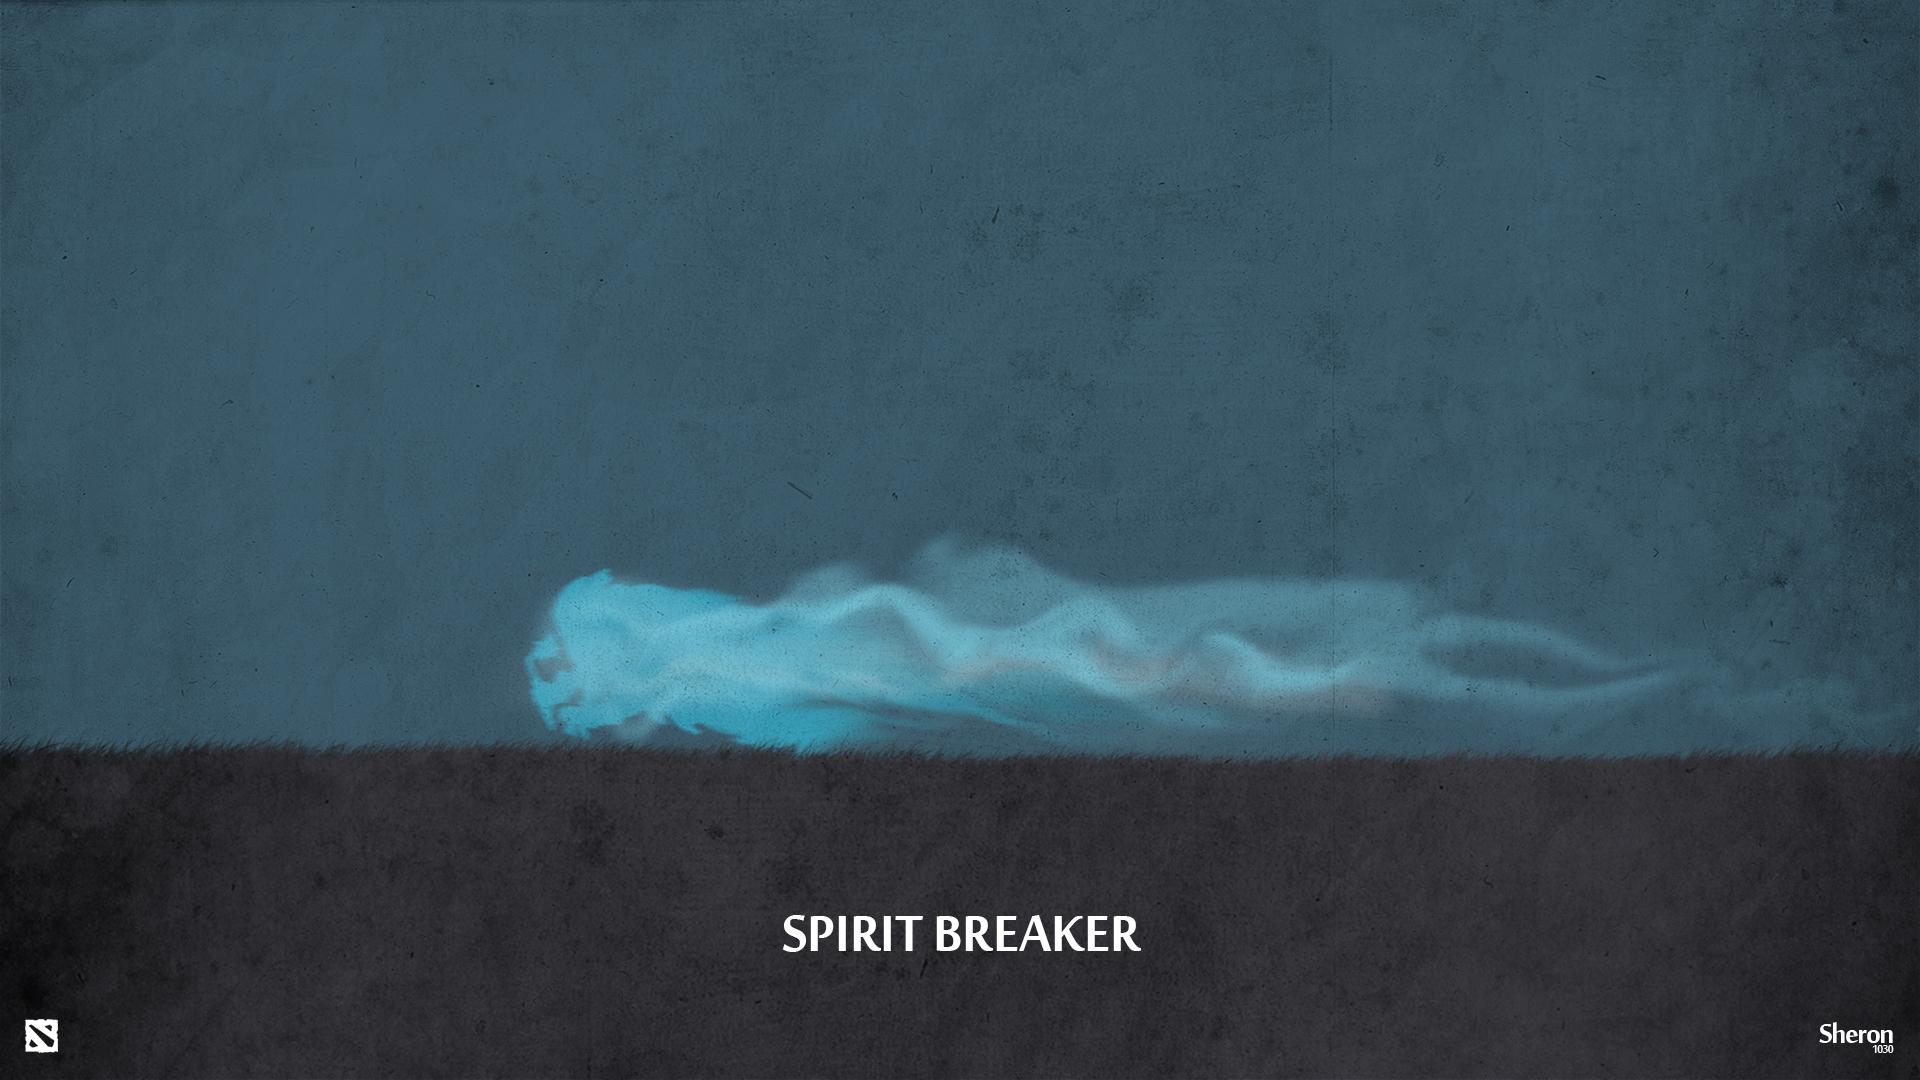 Dota 2 - Spirit Breaker Wallpaper by sheron1030